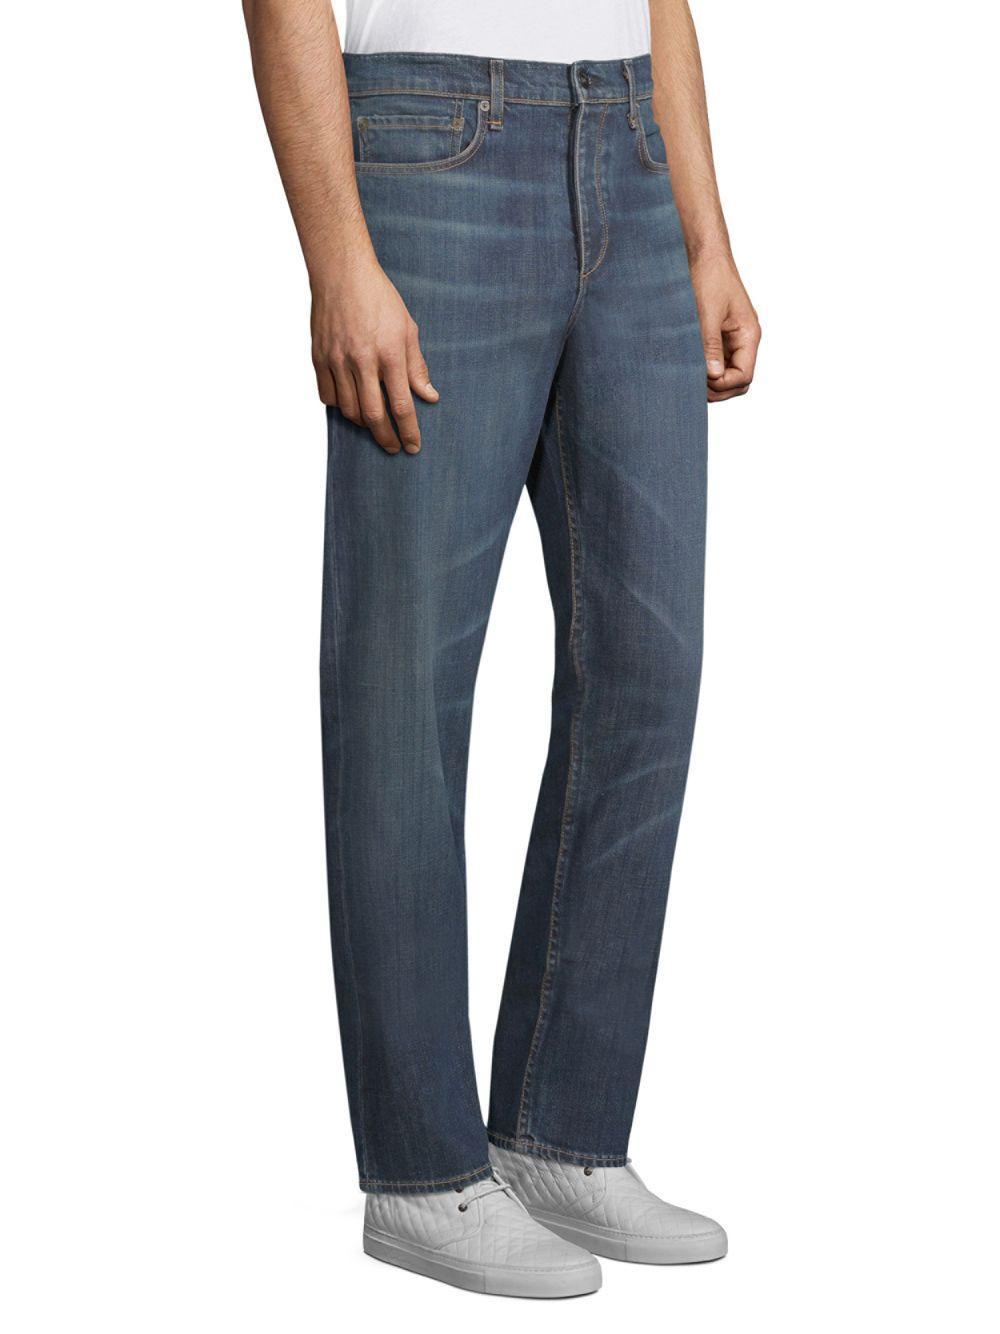 Rag & Bone Denim Fit 3 Slim-fit Classic Jeans in Blue for Men